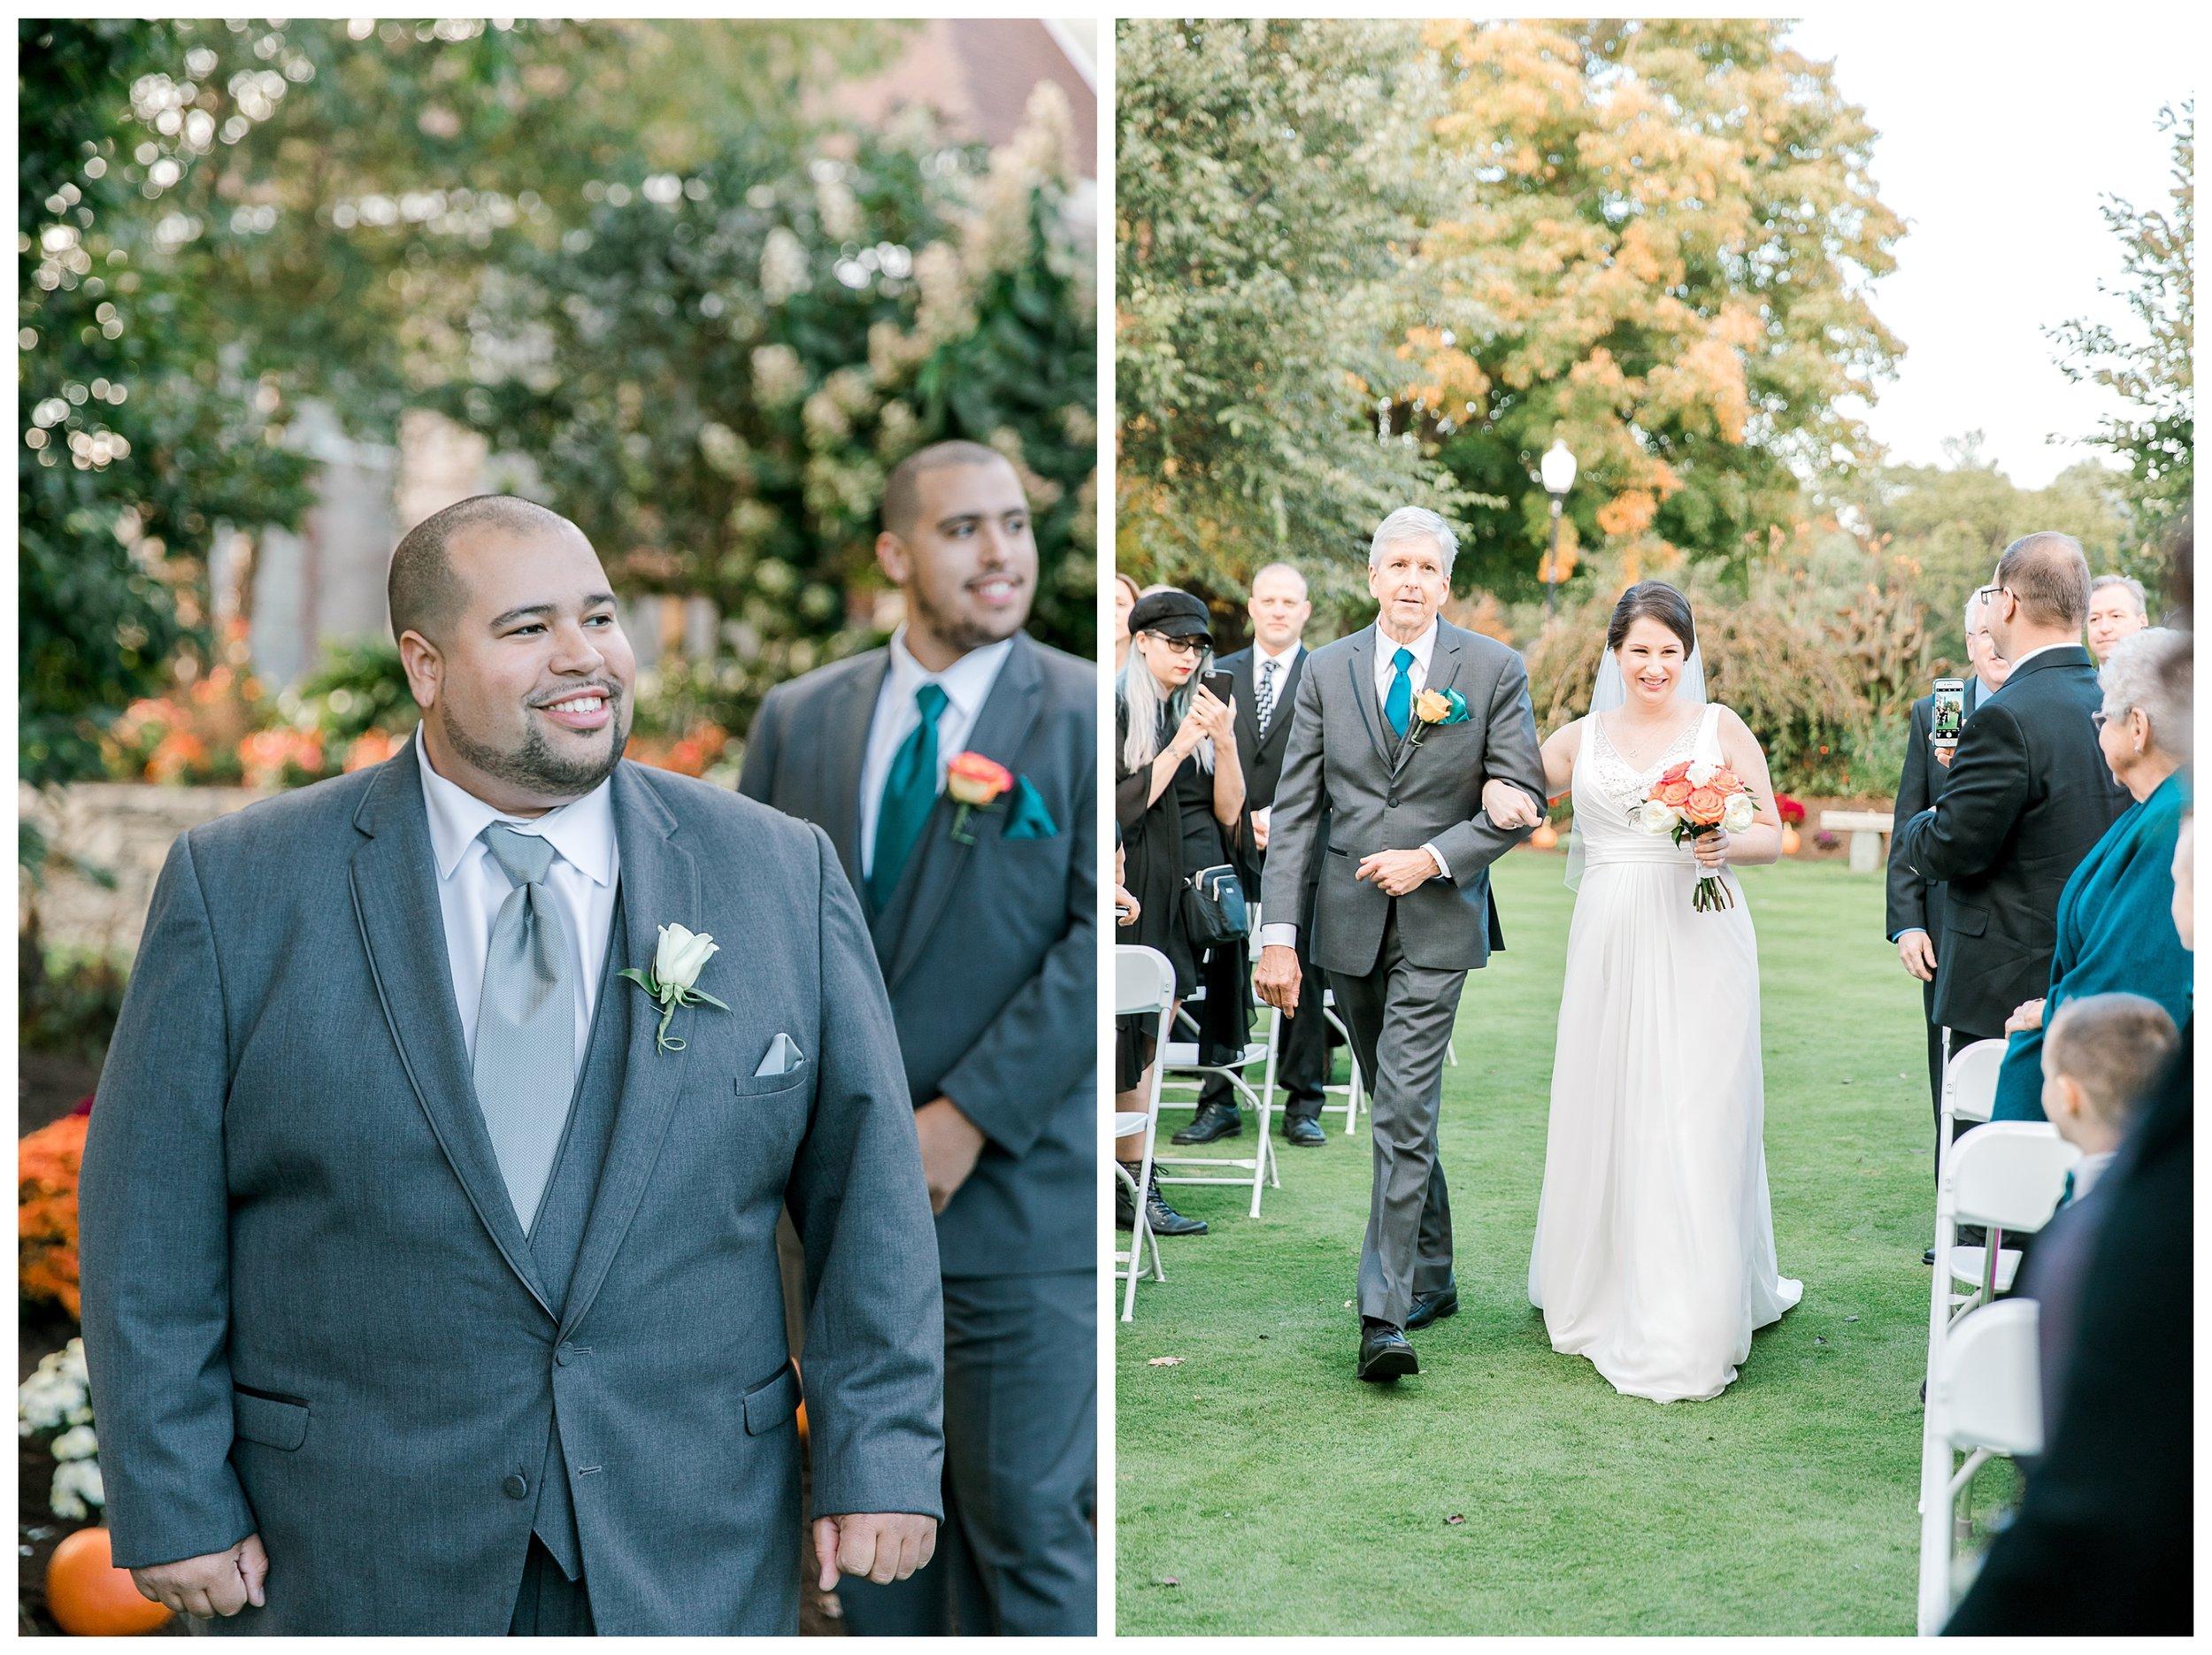 pleasant_valley_country_club_wedding_sutton_erica_pezente_photography (46).jpg